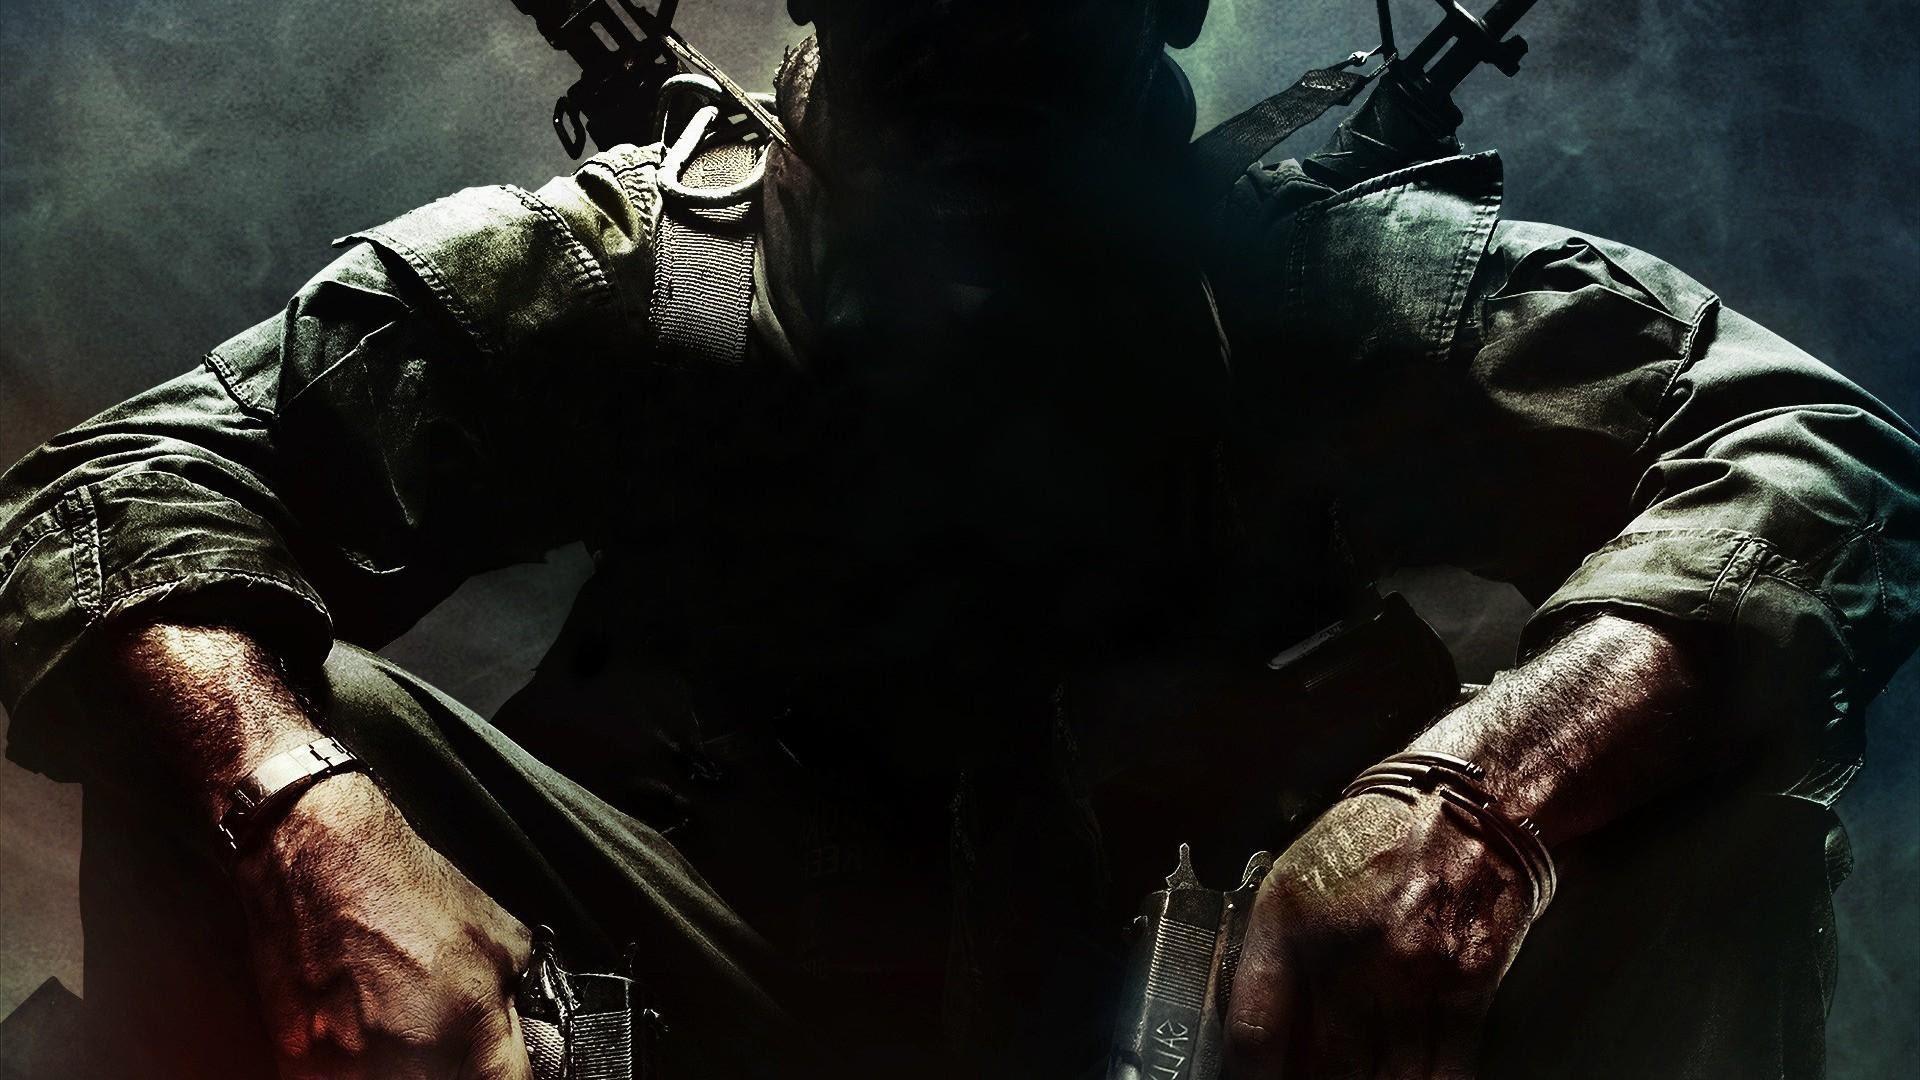 Black Ops Wallpaper Hd 74 Images